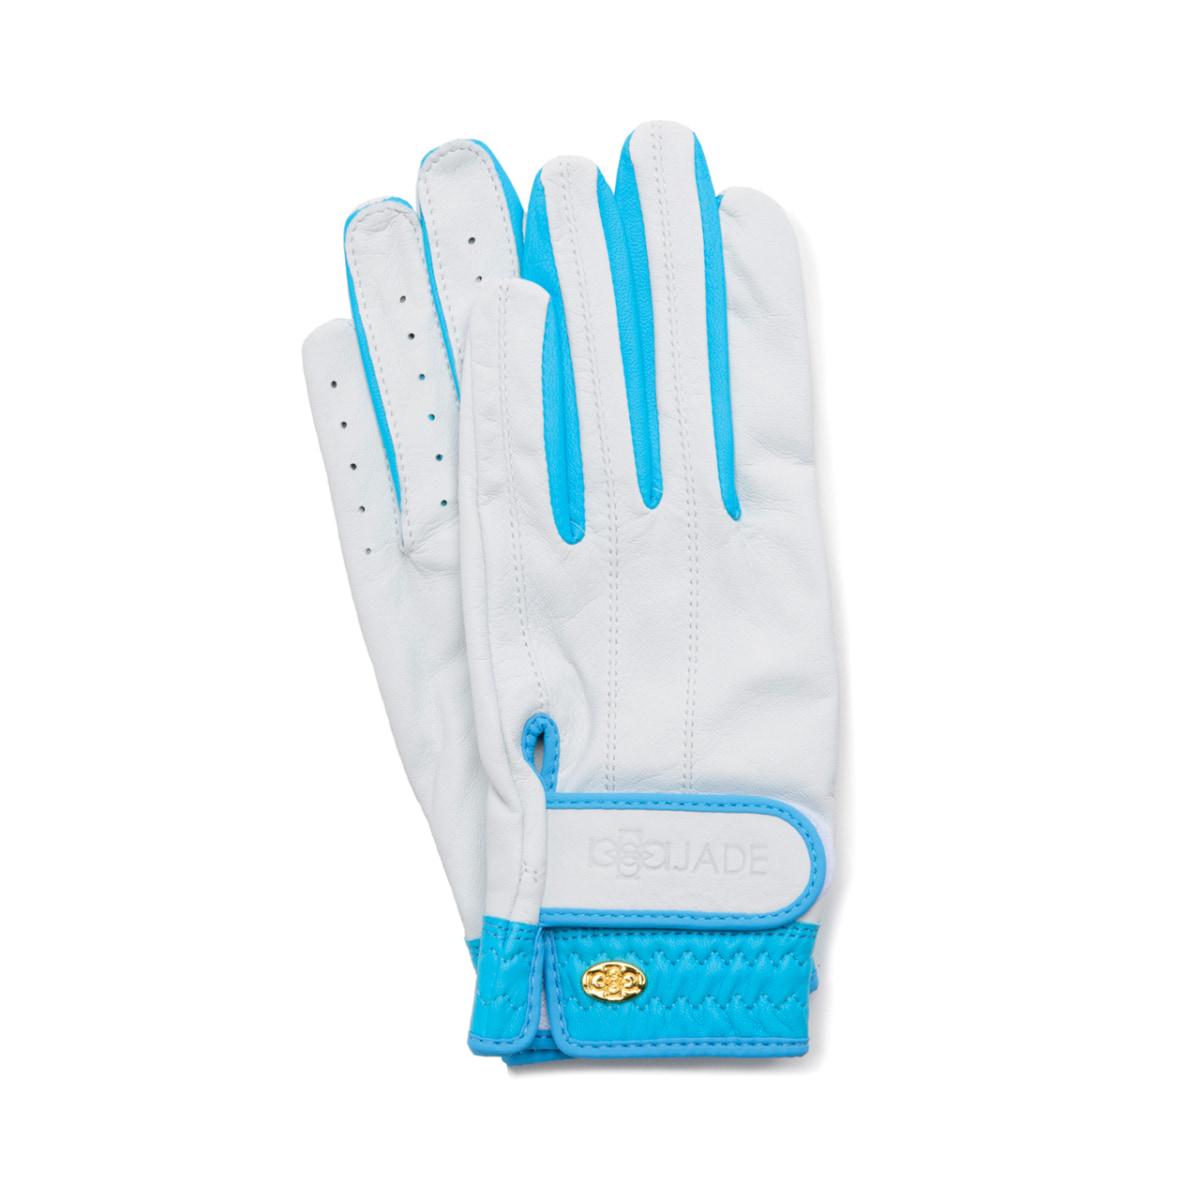 Elegant Golf Glove【両手】white-pacific